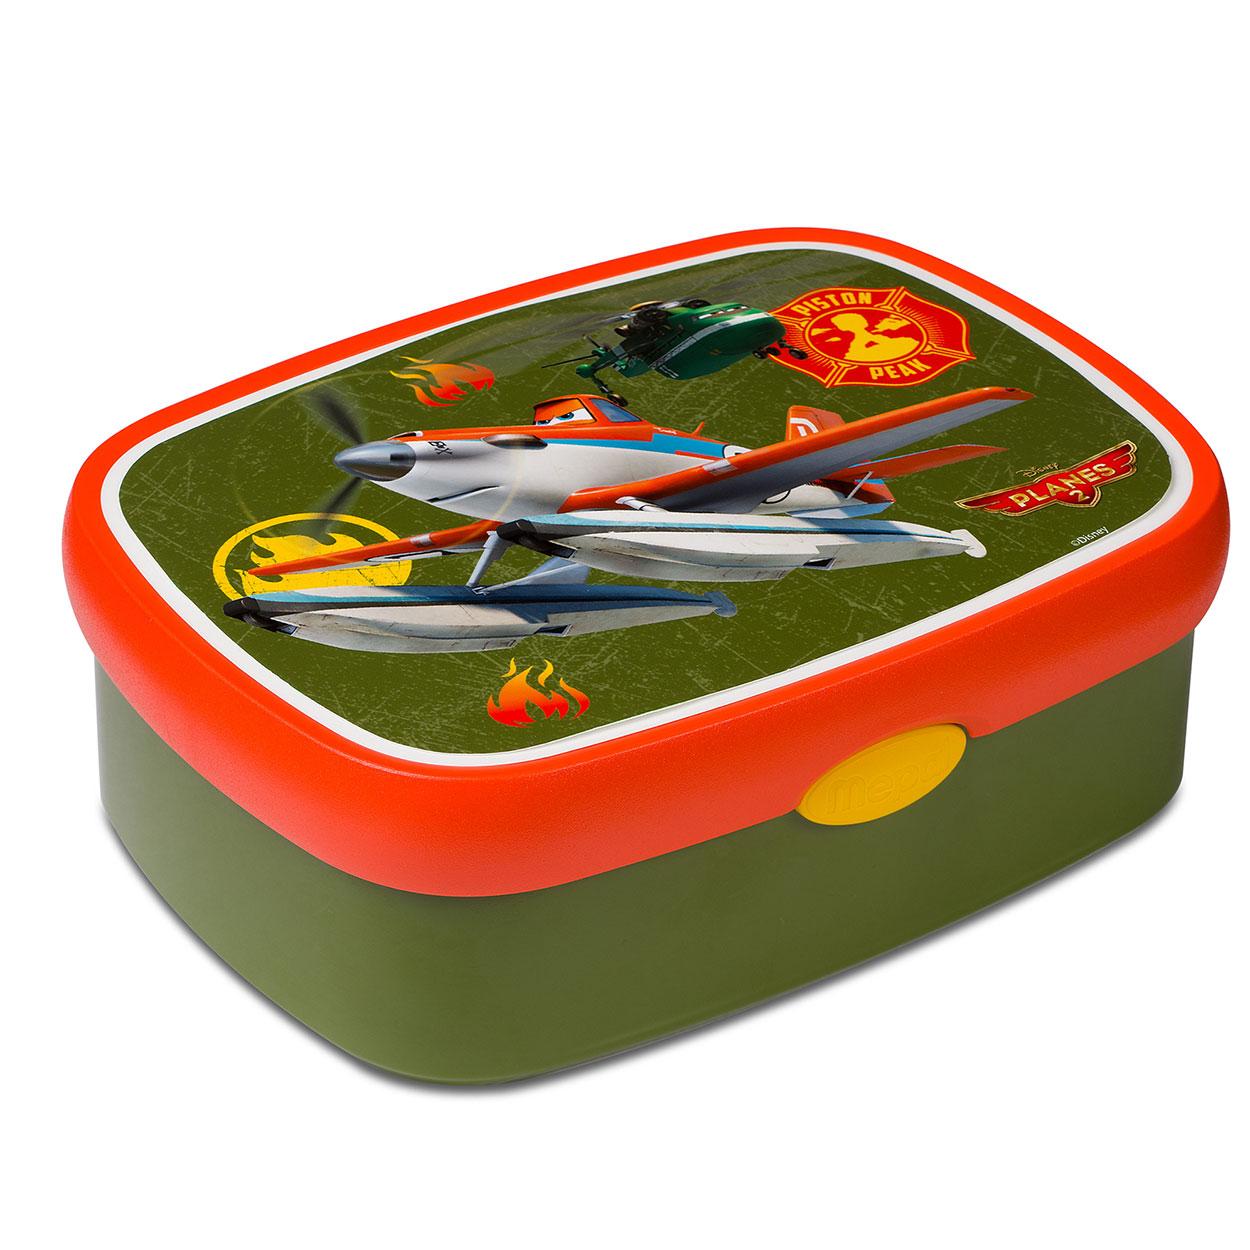 mepal campus lunchbox midi planes 2 online kopen. Black Bedroom Furniture Sets. Home Design Ideas